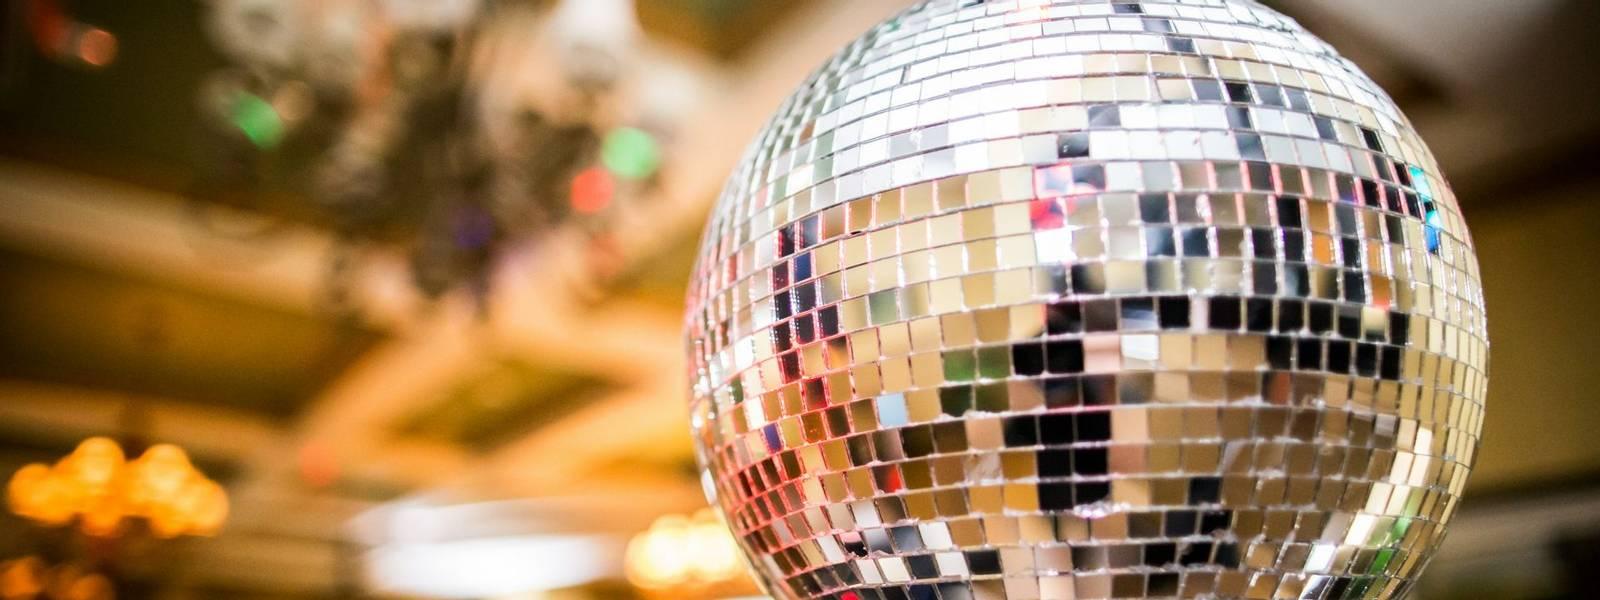 Dancing-Ballroom&Latin-AdobeStock_198530271.jpeg